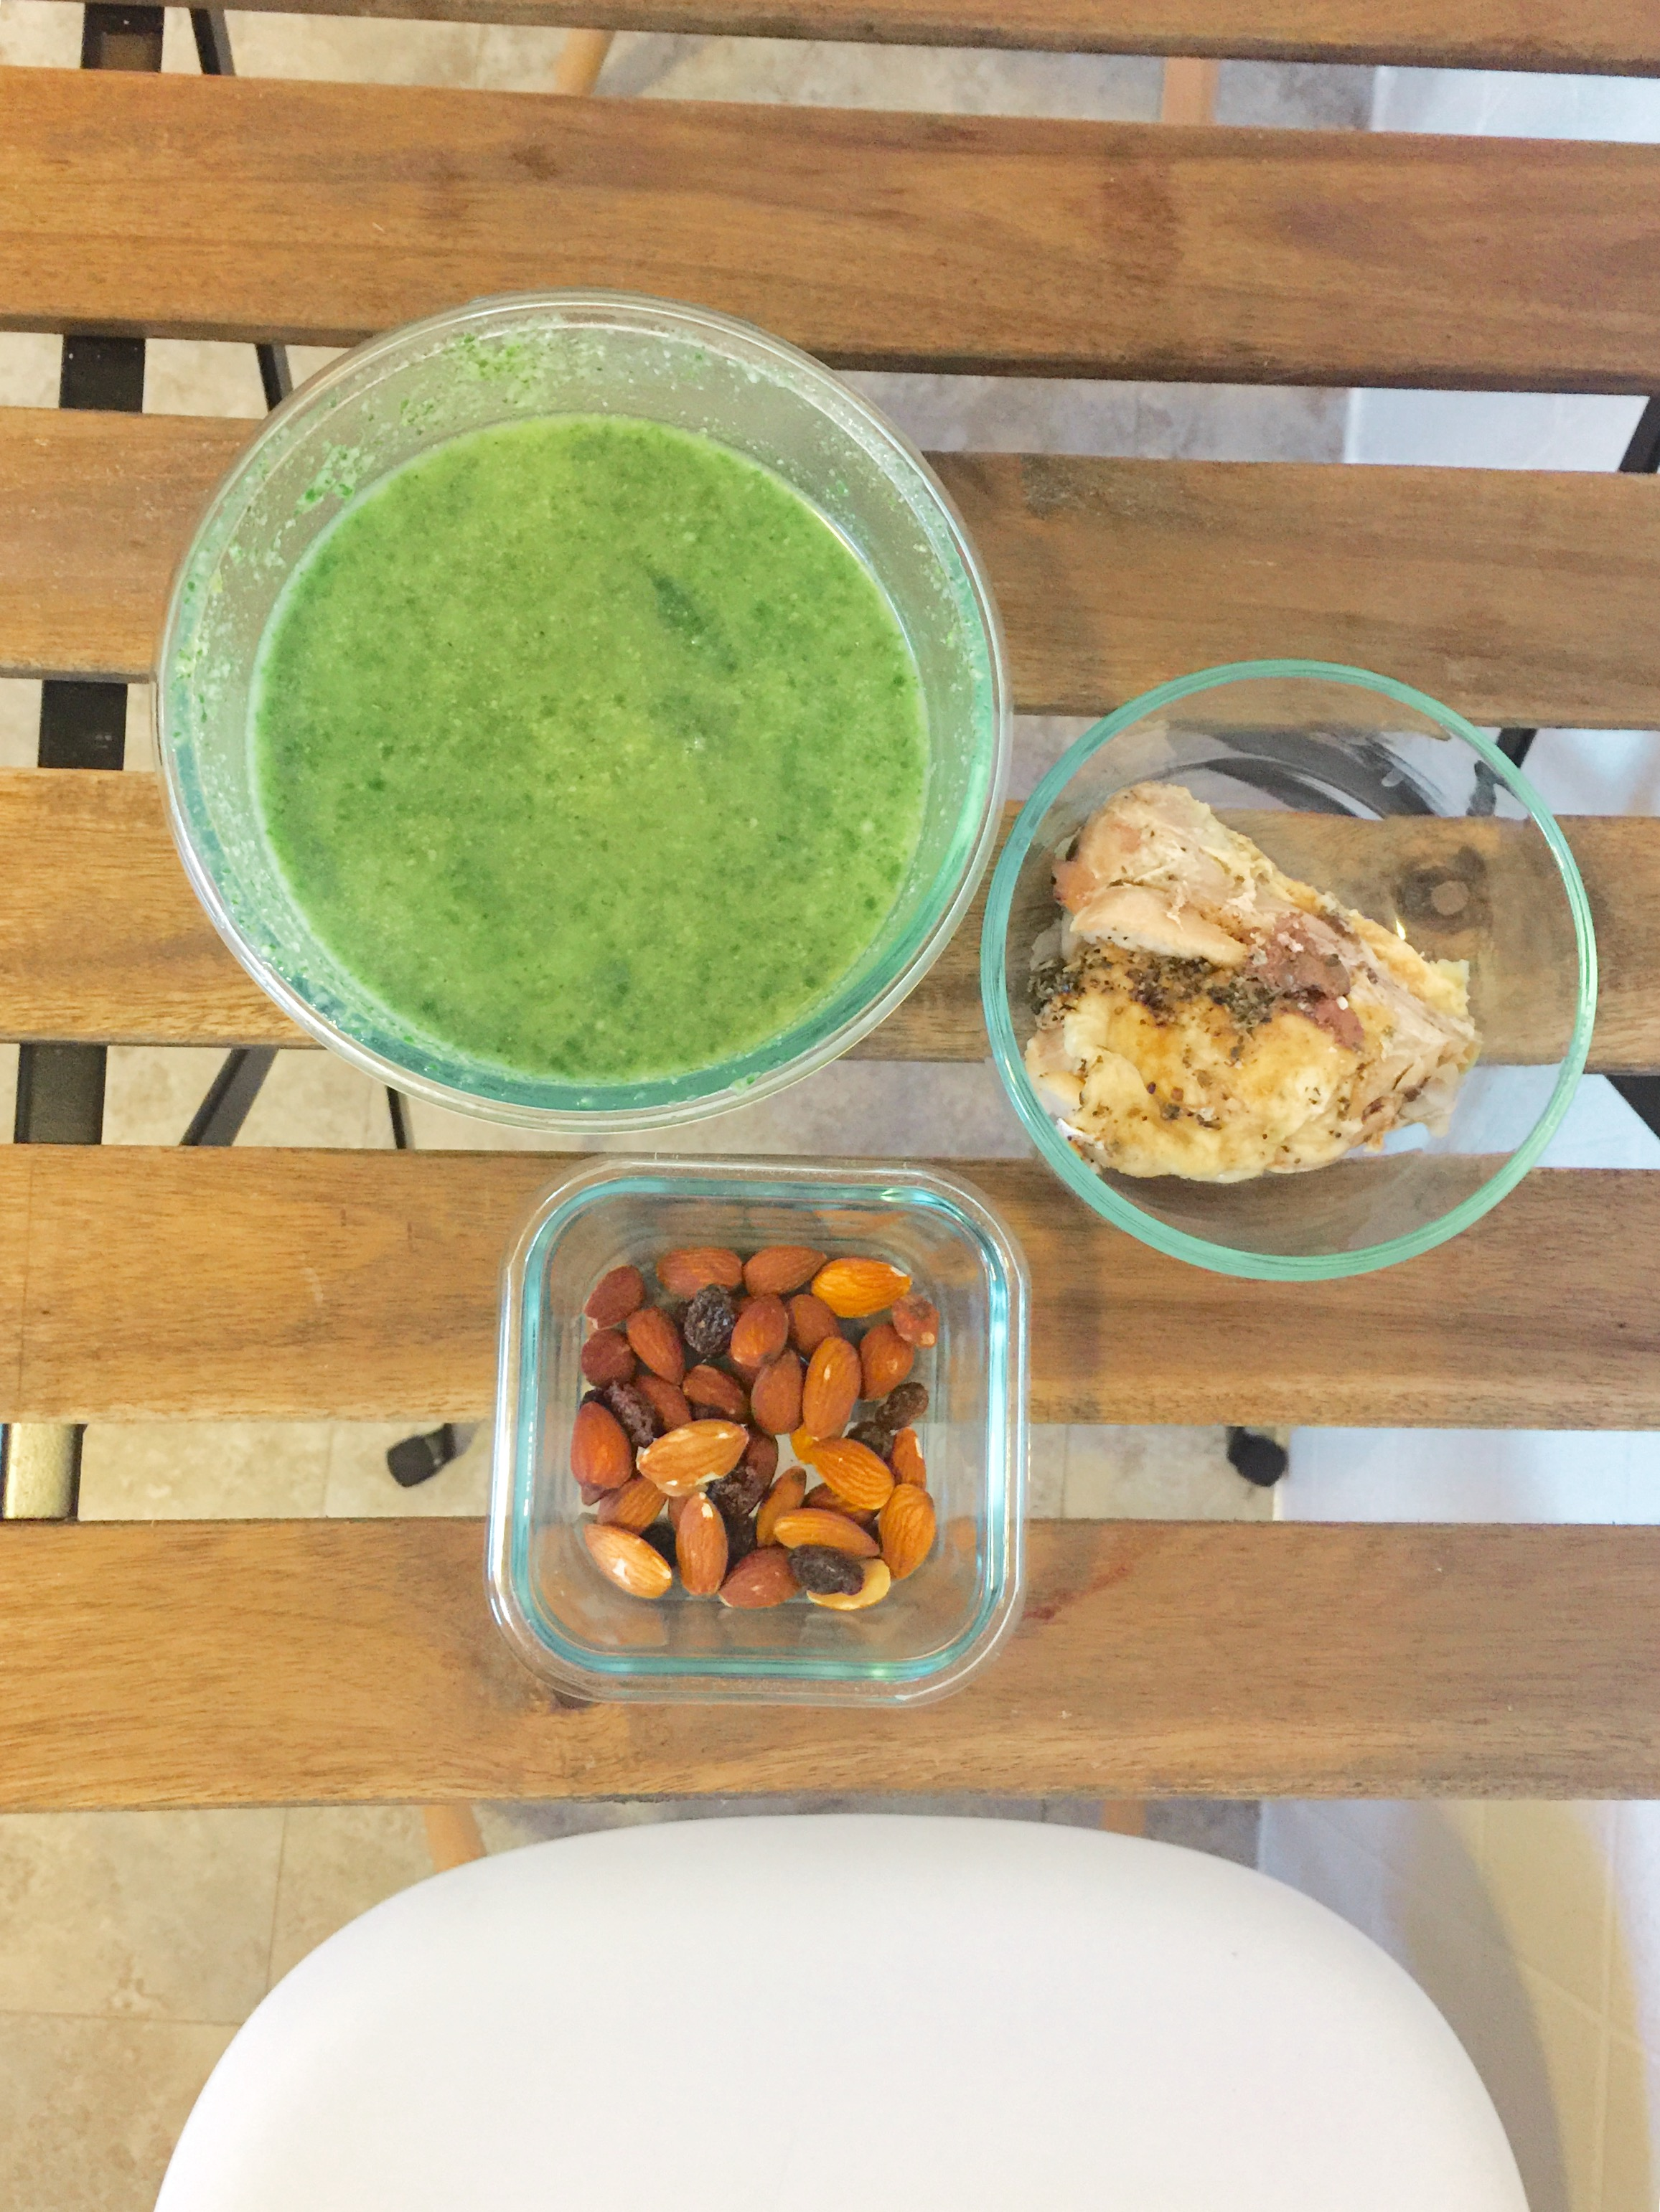 Spinach broccoli coconut cream soup, seasoned chicken thigh, almonds and raisins